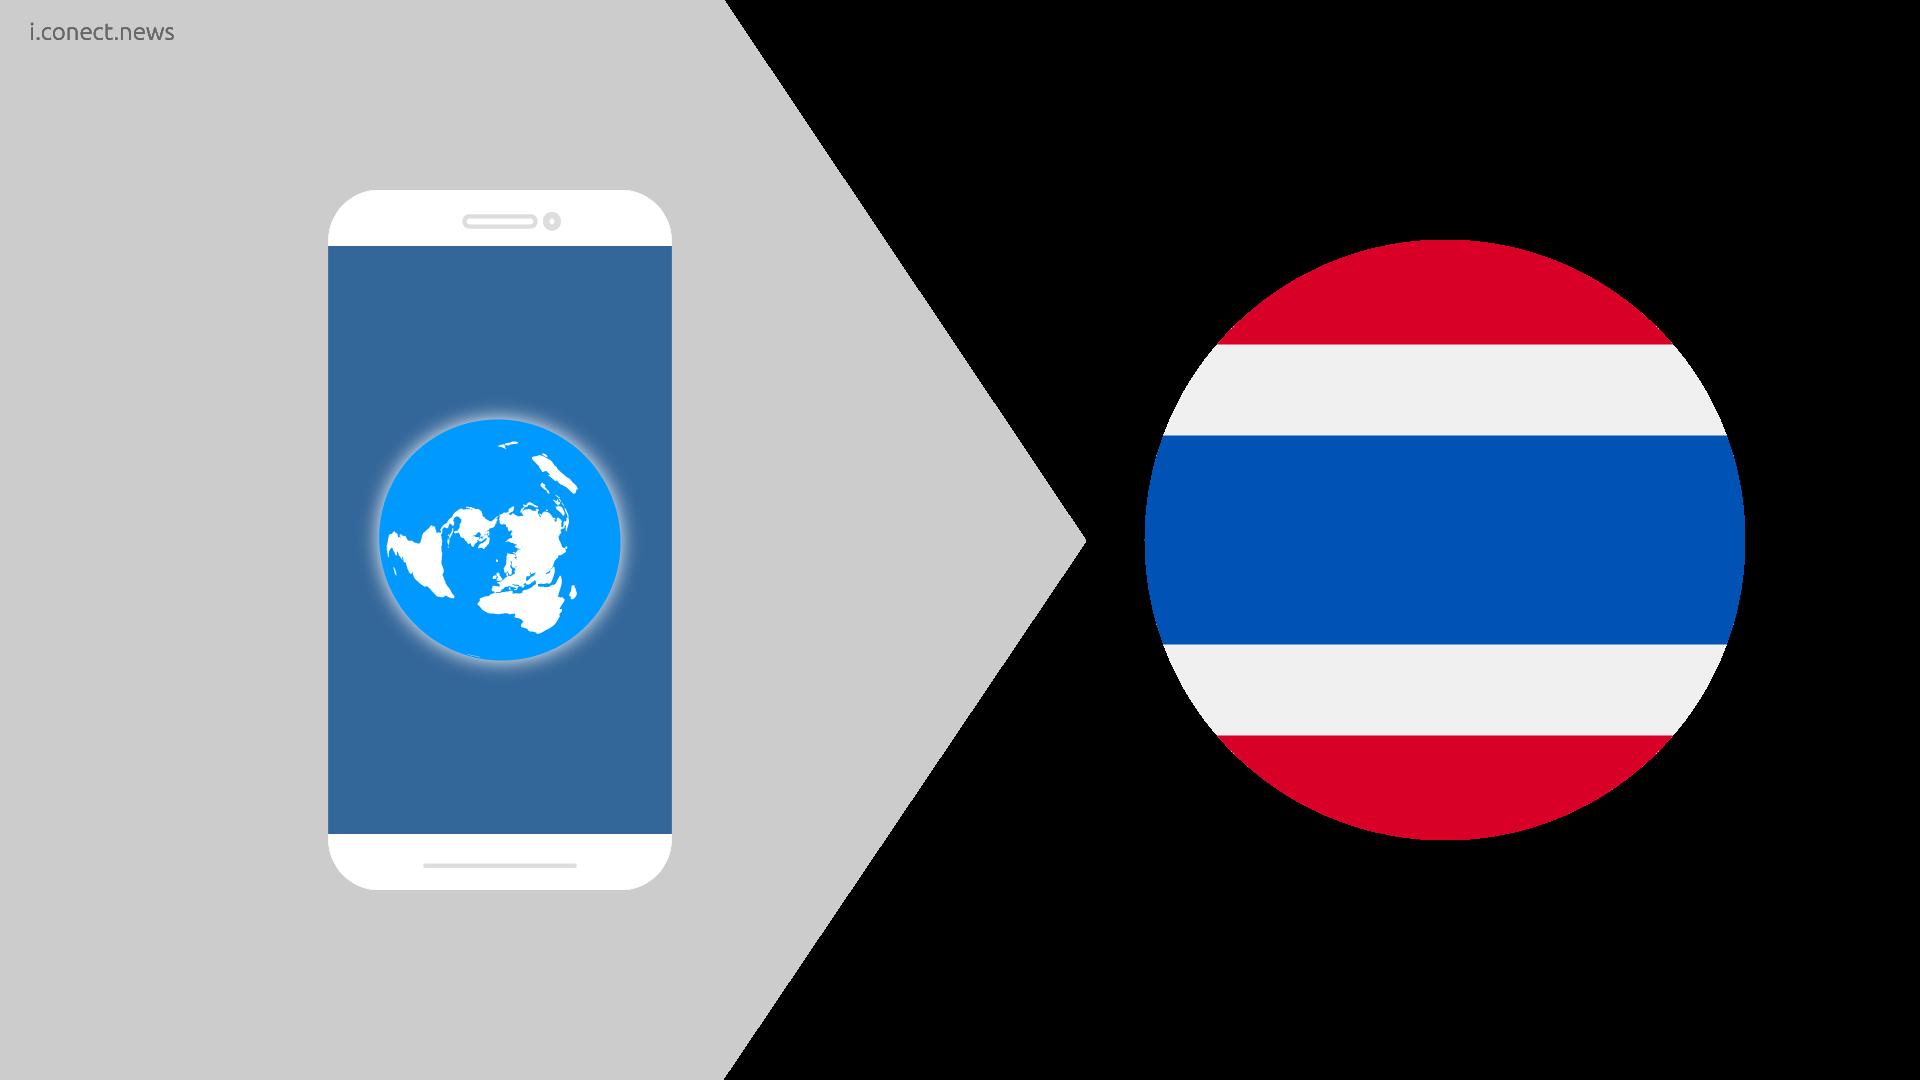 Calling Thailand  @conect_news